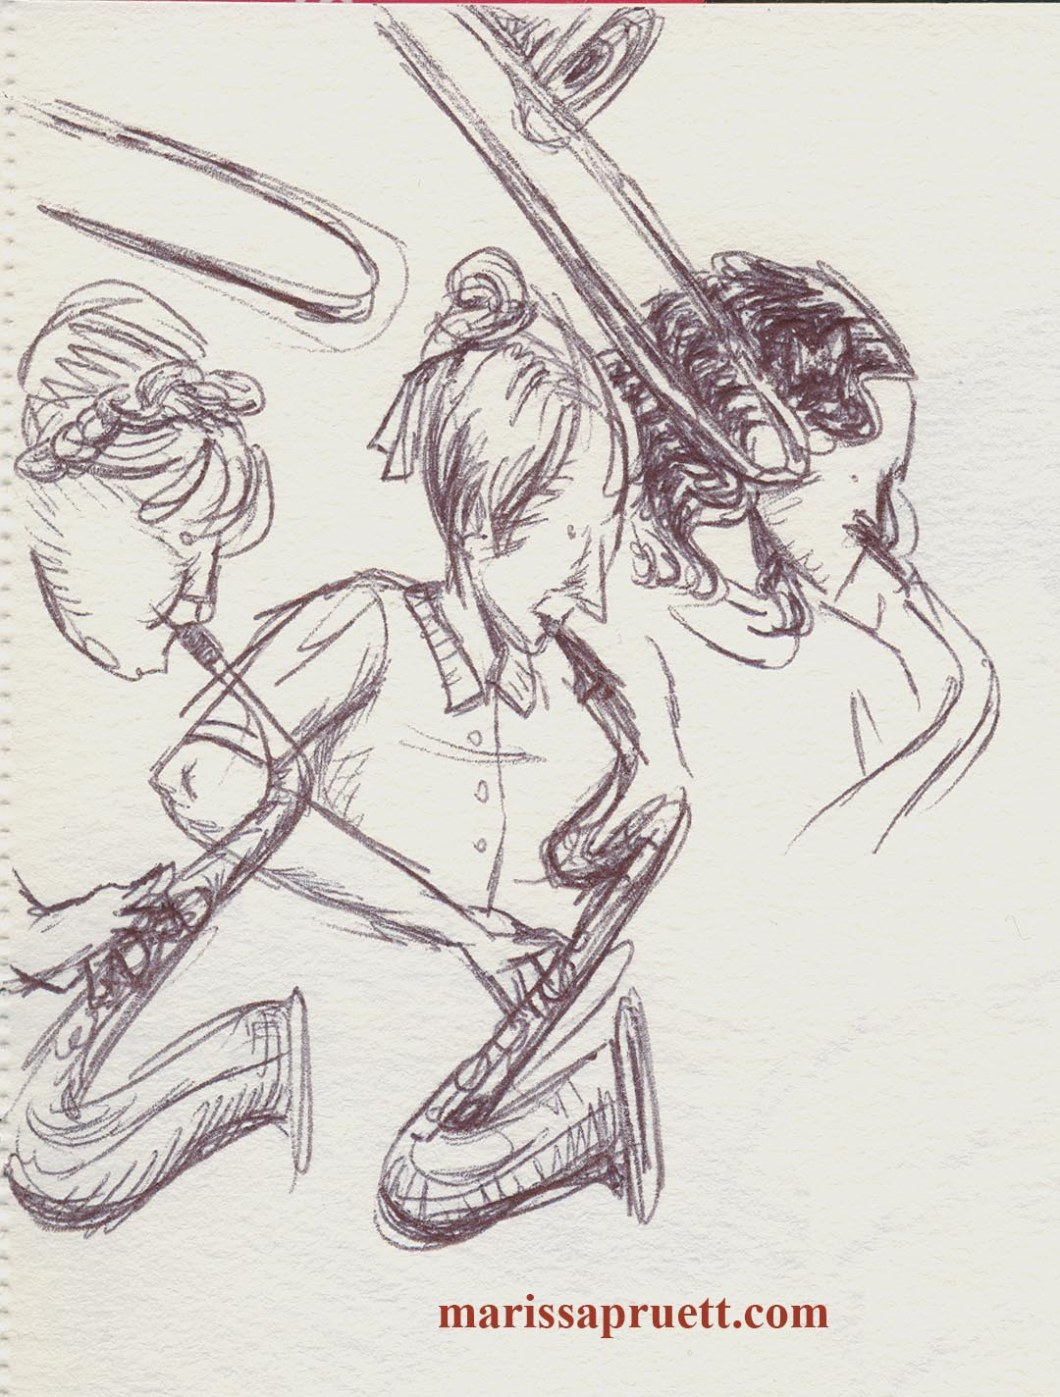 sax and bones